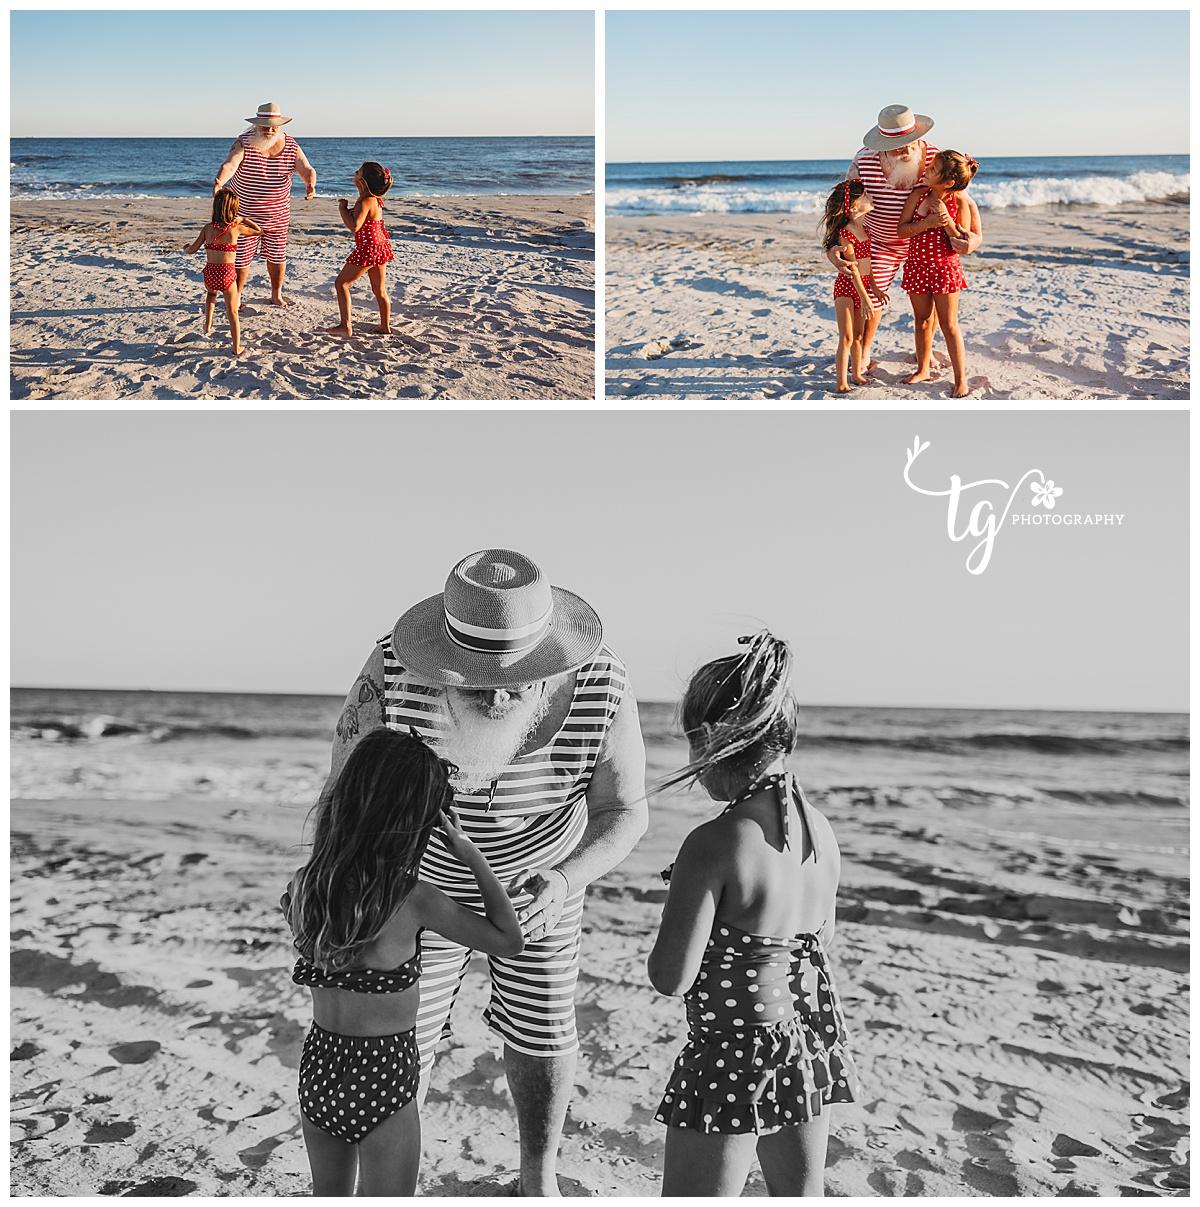 vintage styled beach Santa holiday photo session